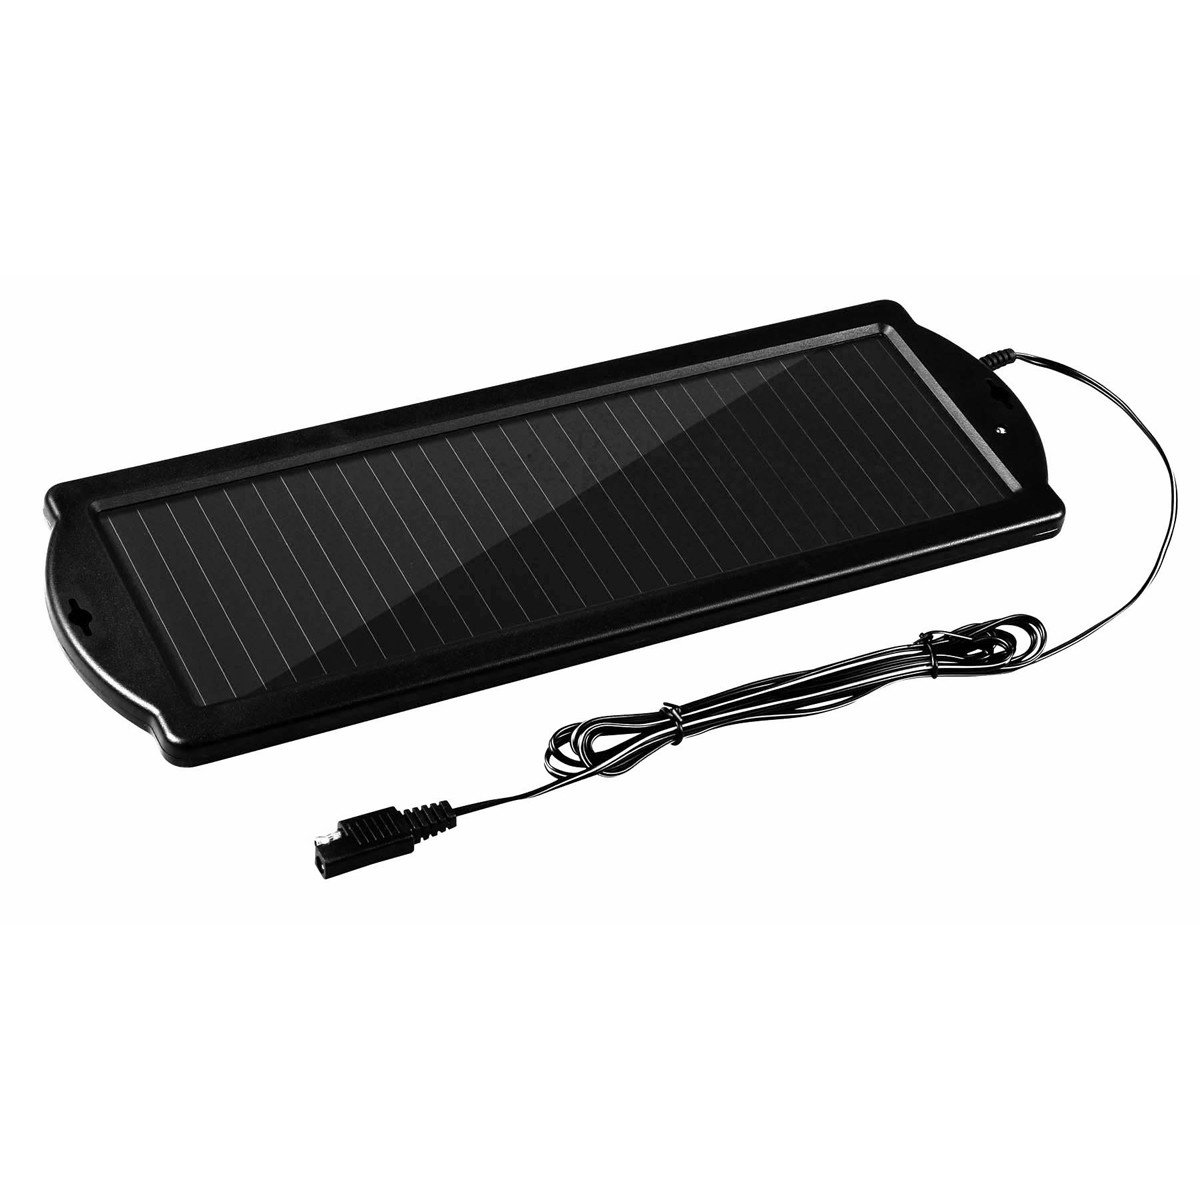 Amazon.com: Thunderbolt Solar Battery Charger 1.5 Watt 12v Amorphous  Crystal: Garden & Outdoor